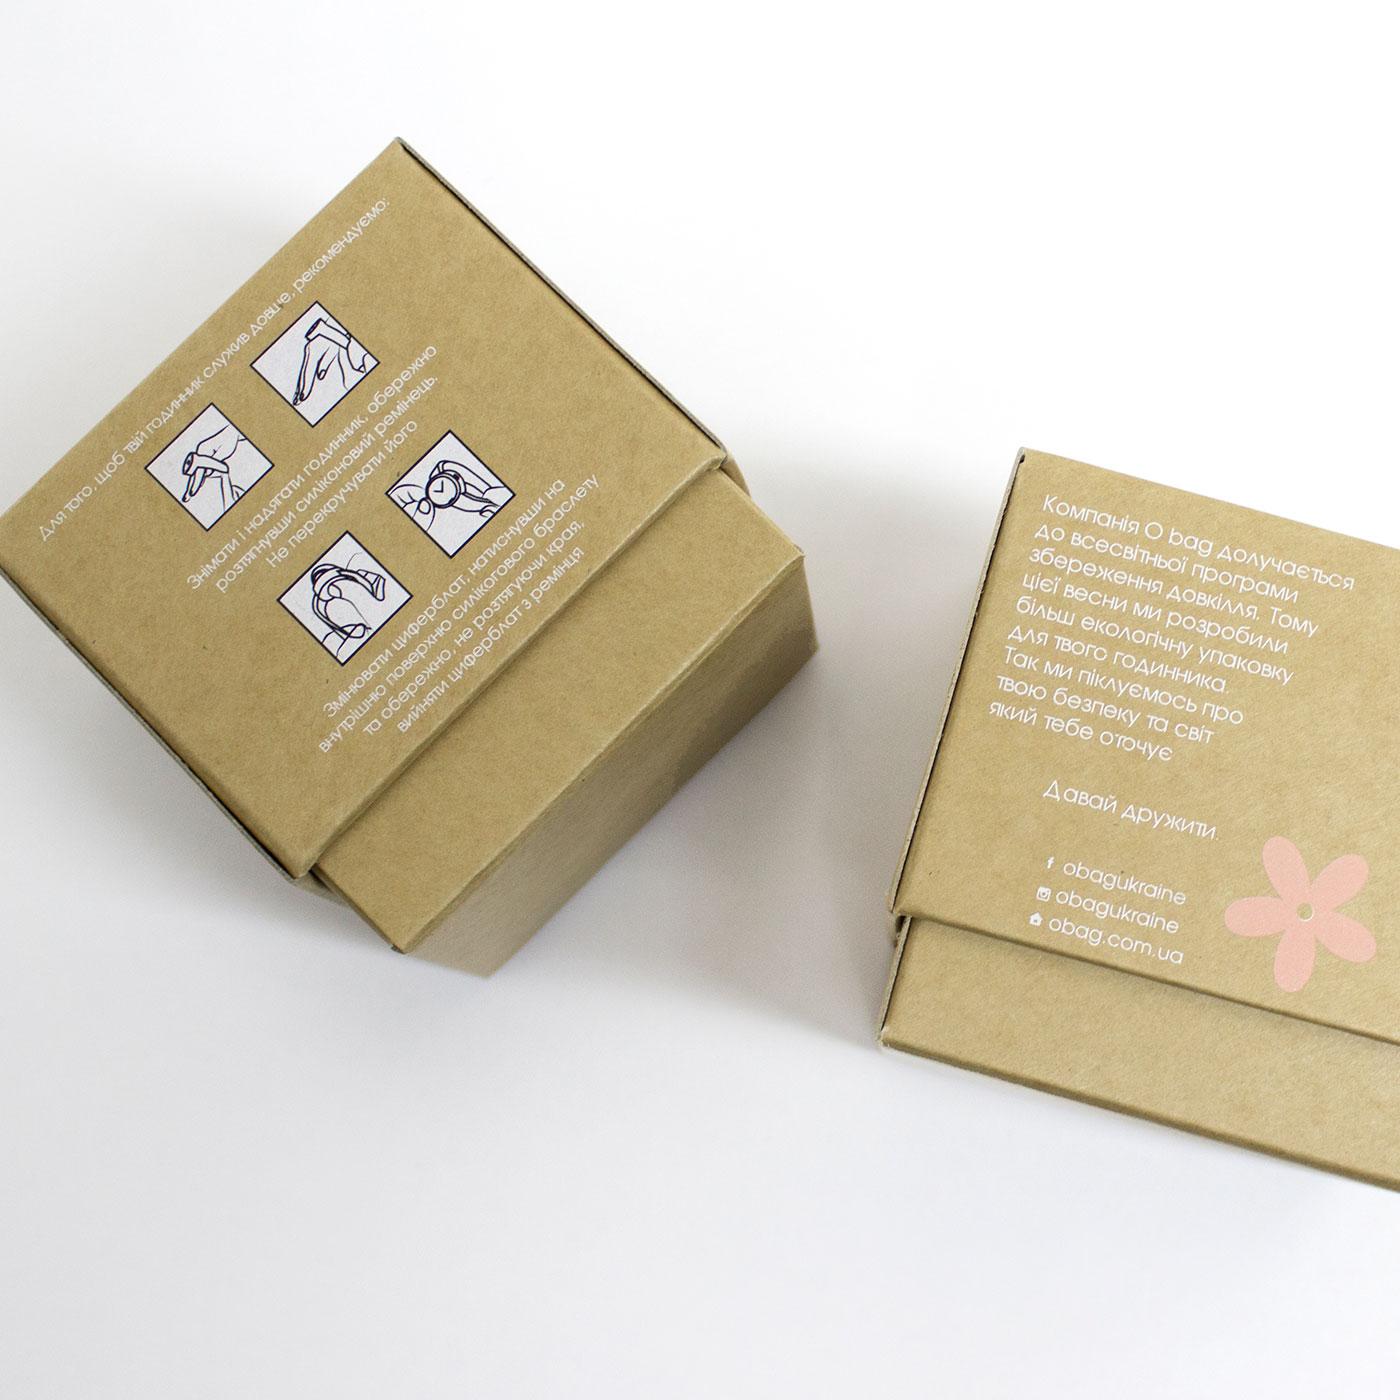 Кубик из крафт картона